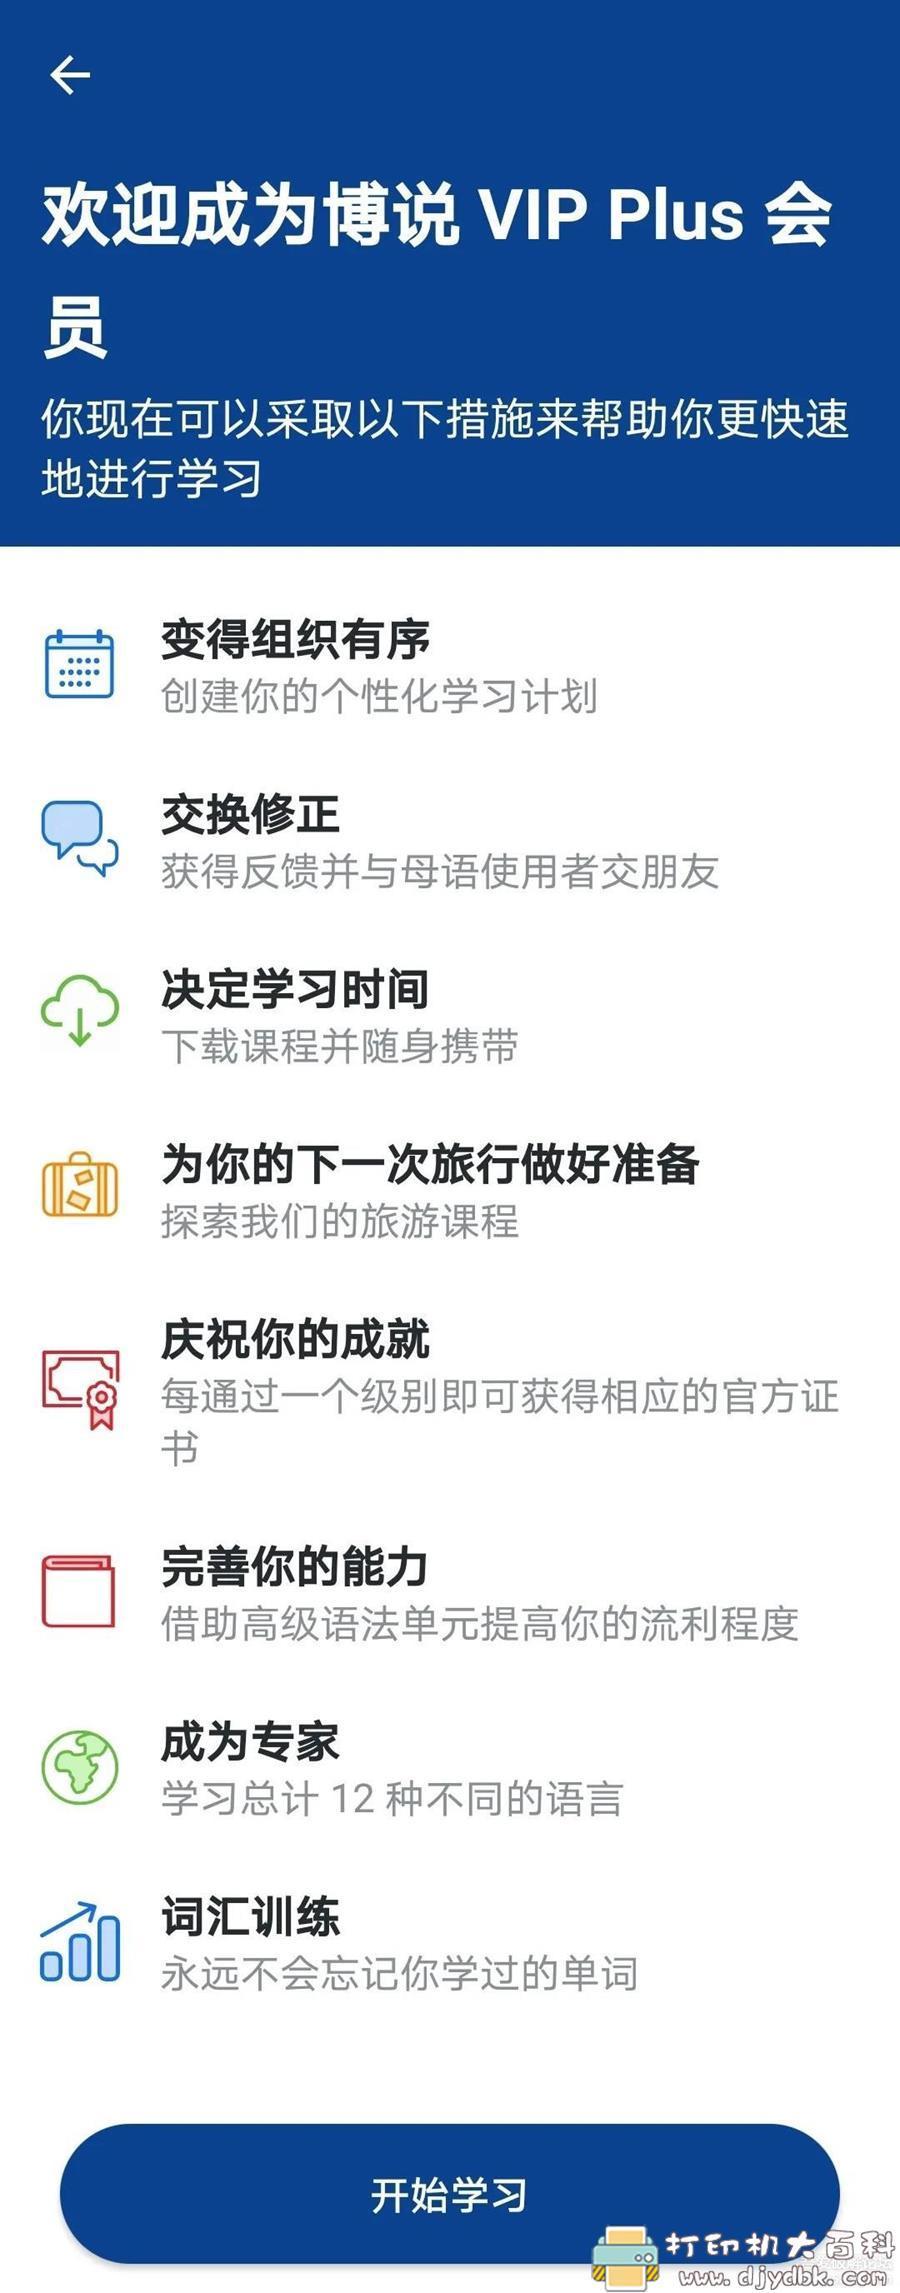 [Android]学习外语的软件 博说【已破解永久VIP】图片 No.3